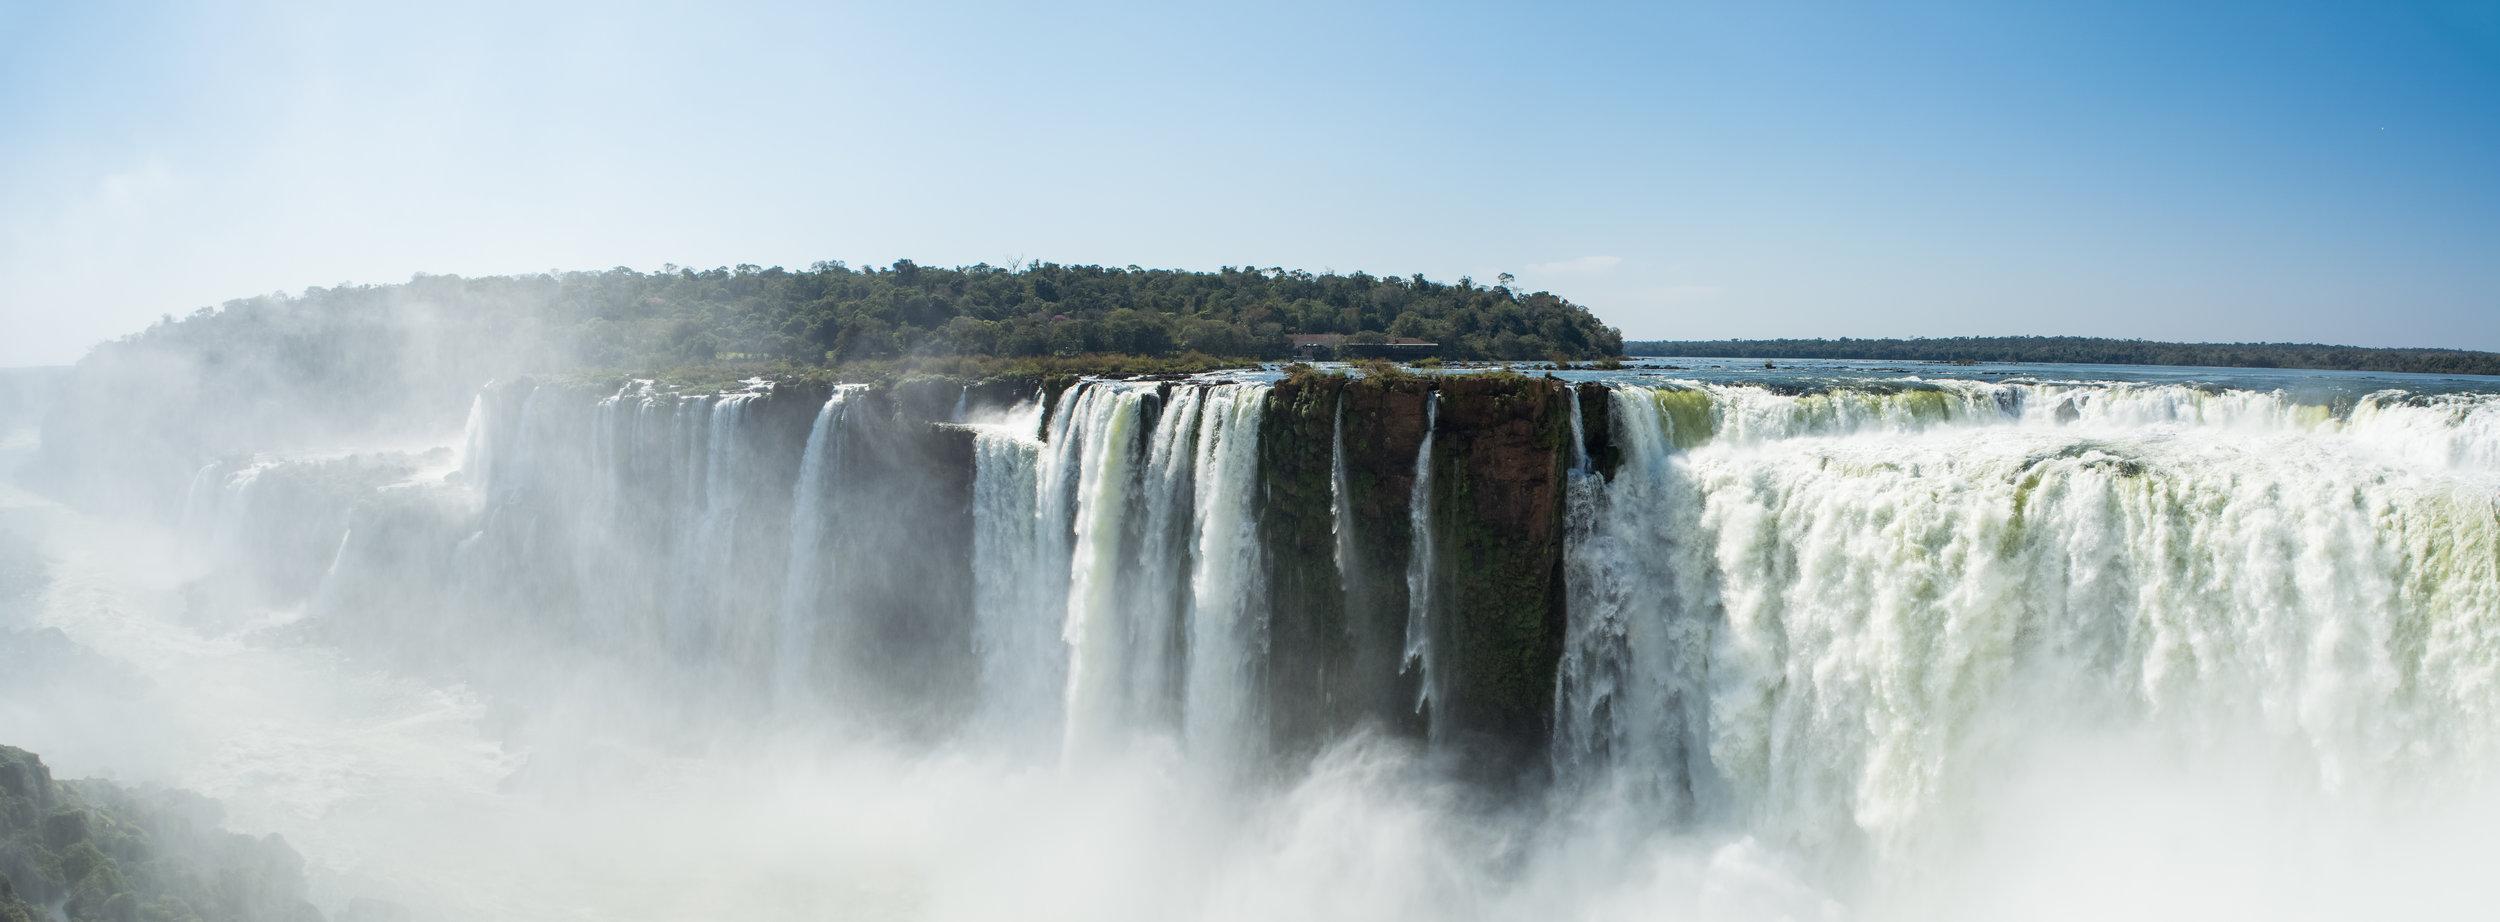 Iguazu falls Argentina – Mind the Pack